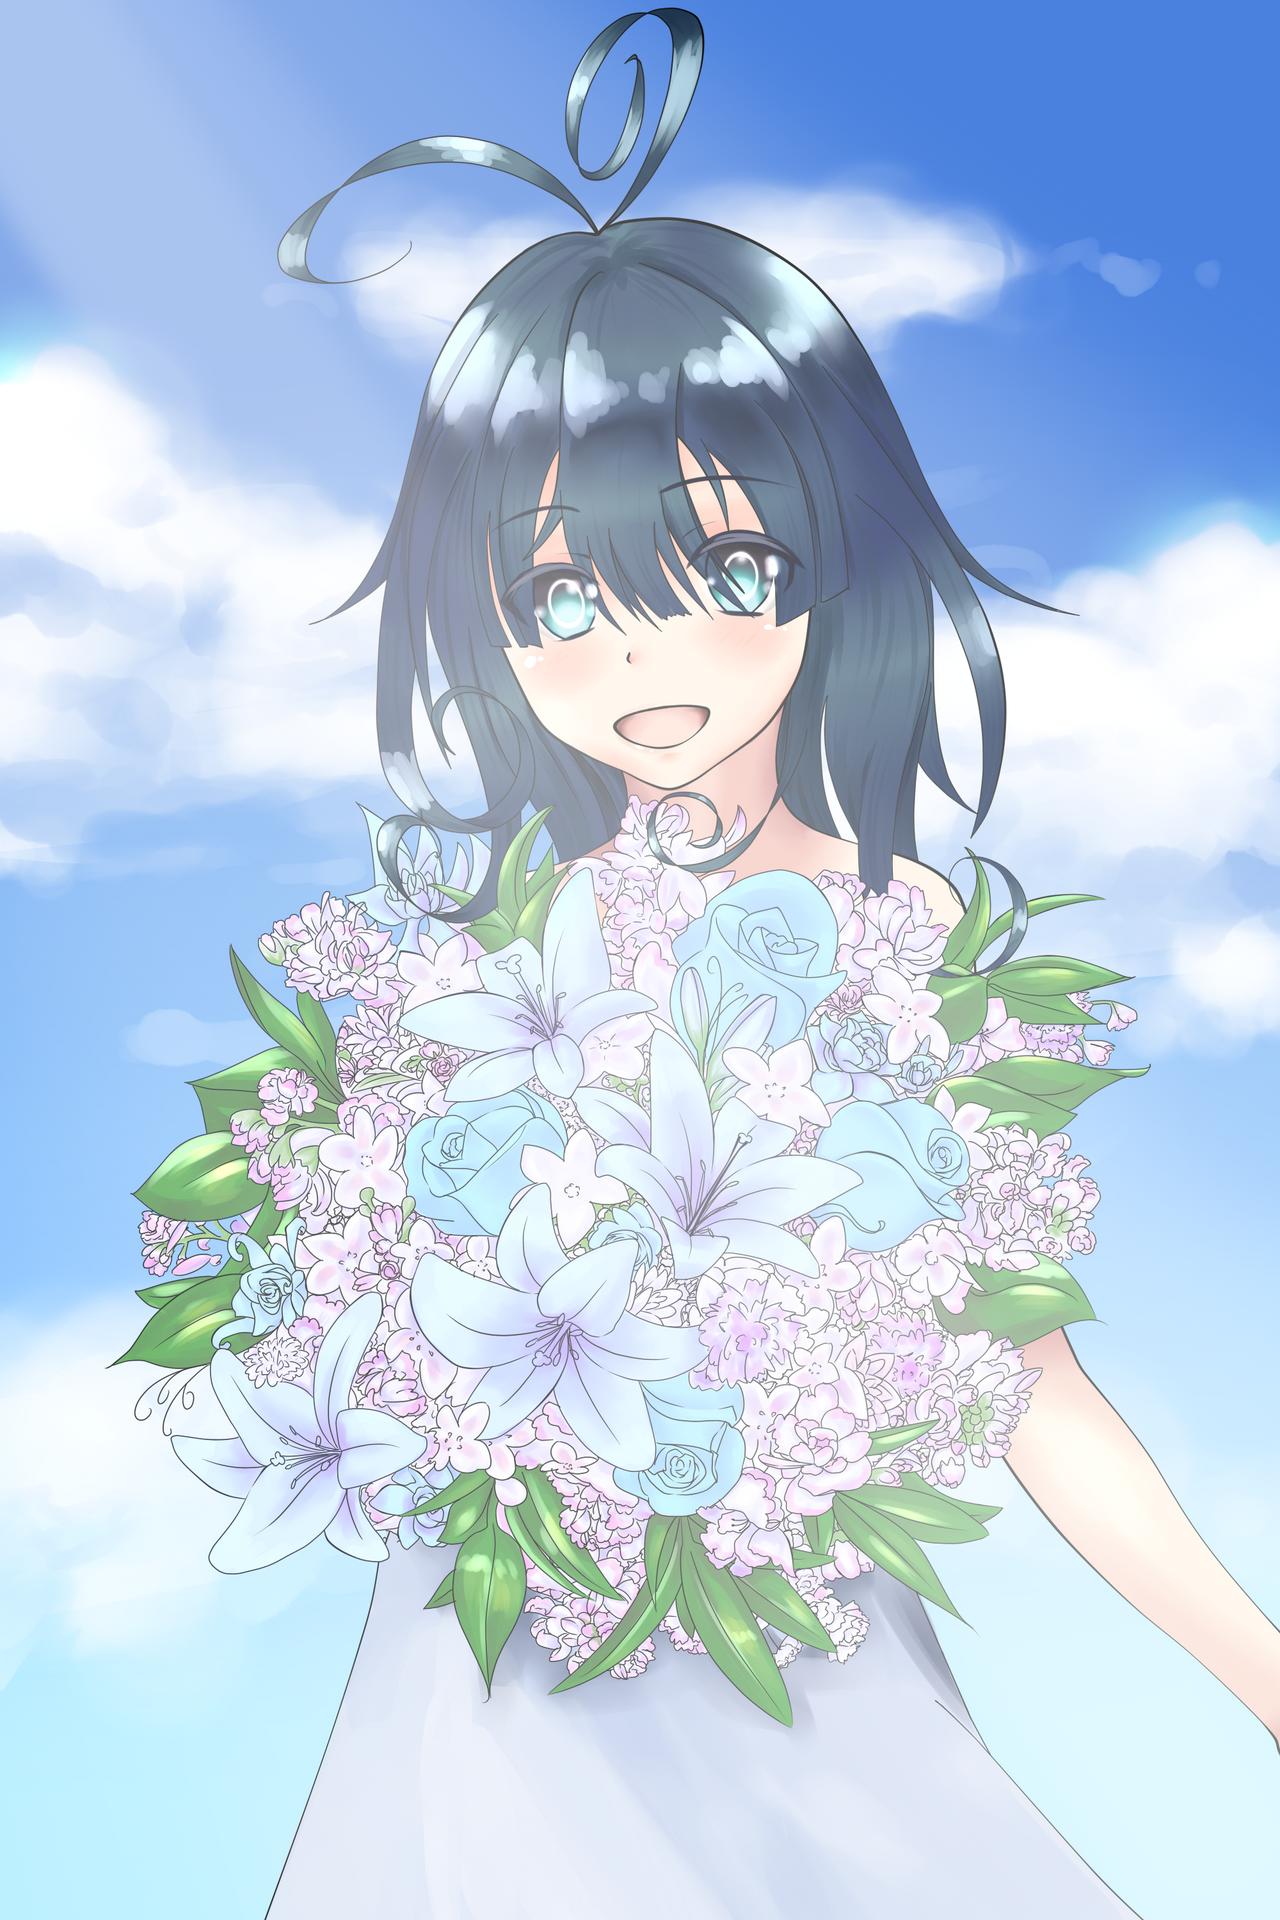 DP109: Blue flower, Aoi hana by Floupfloup